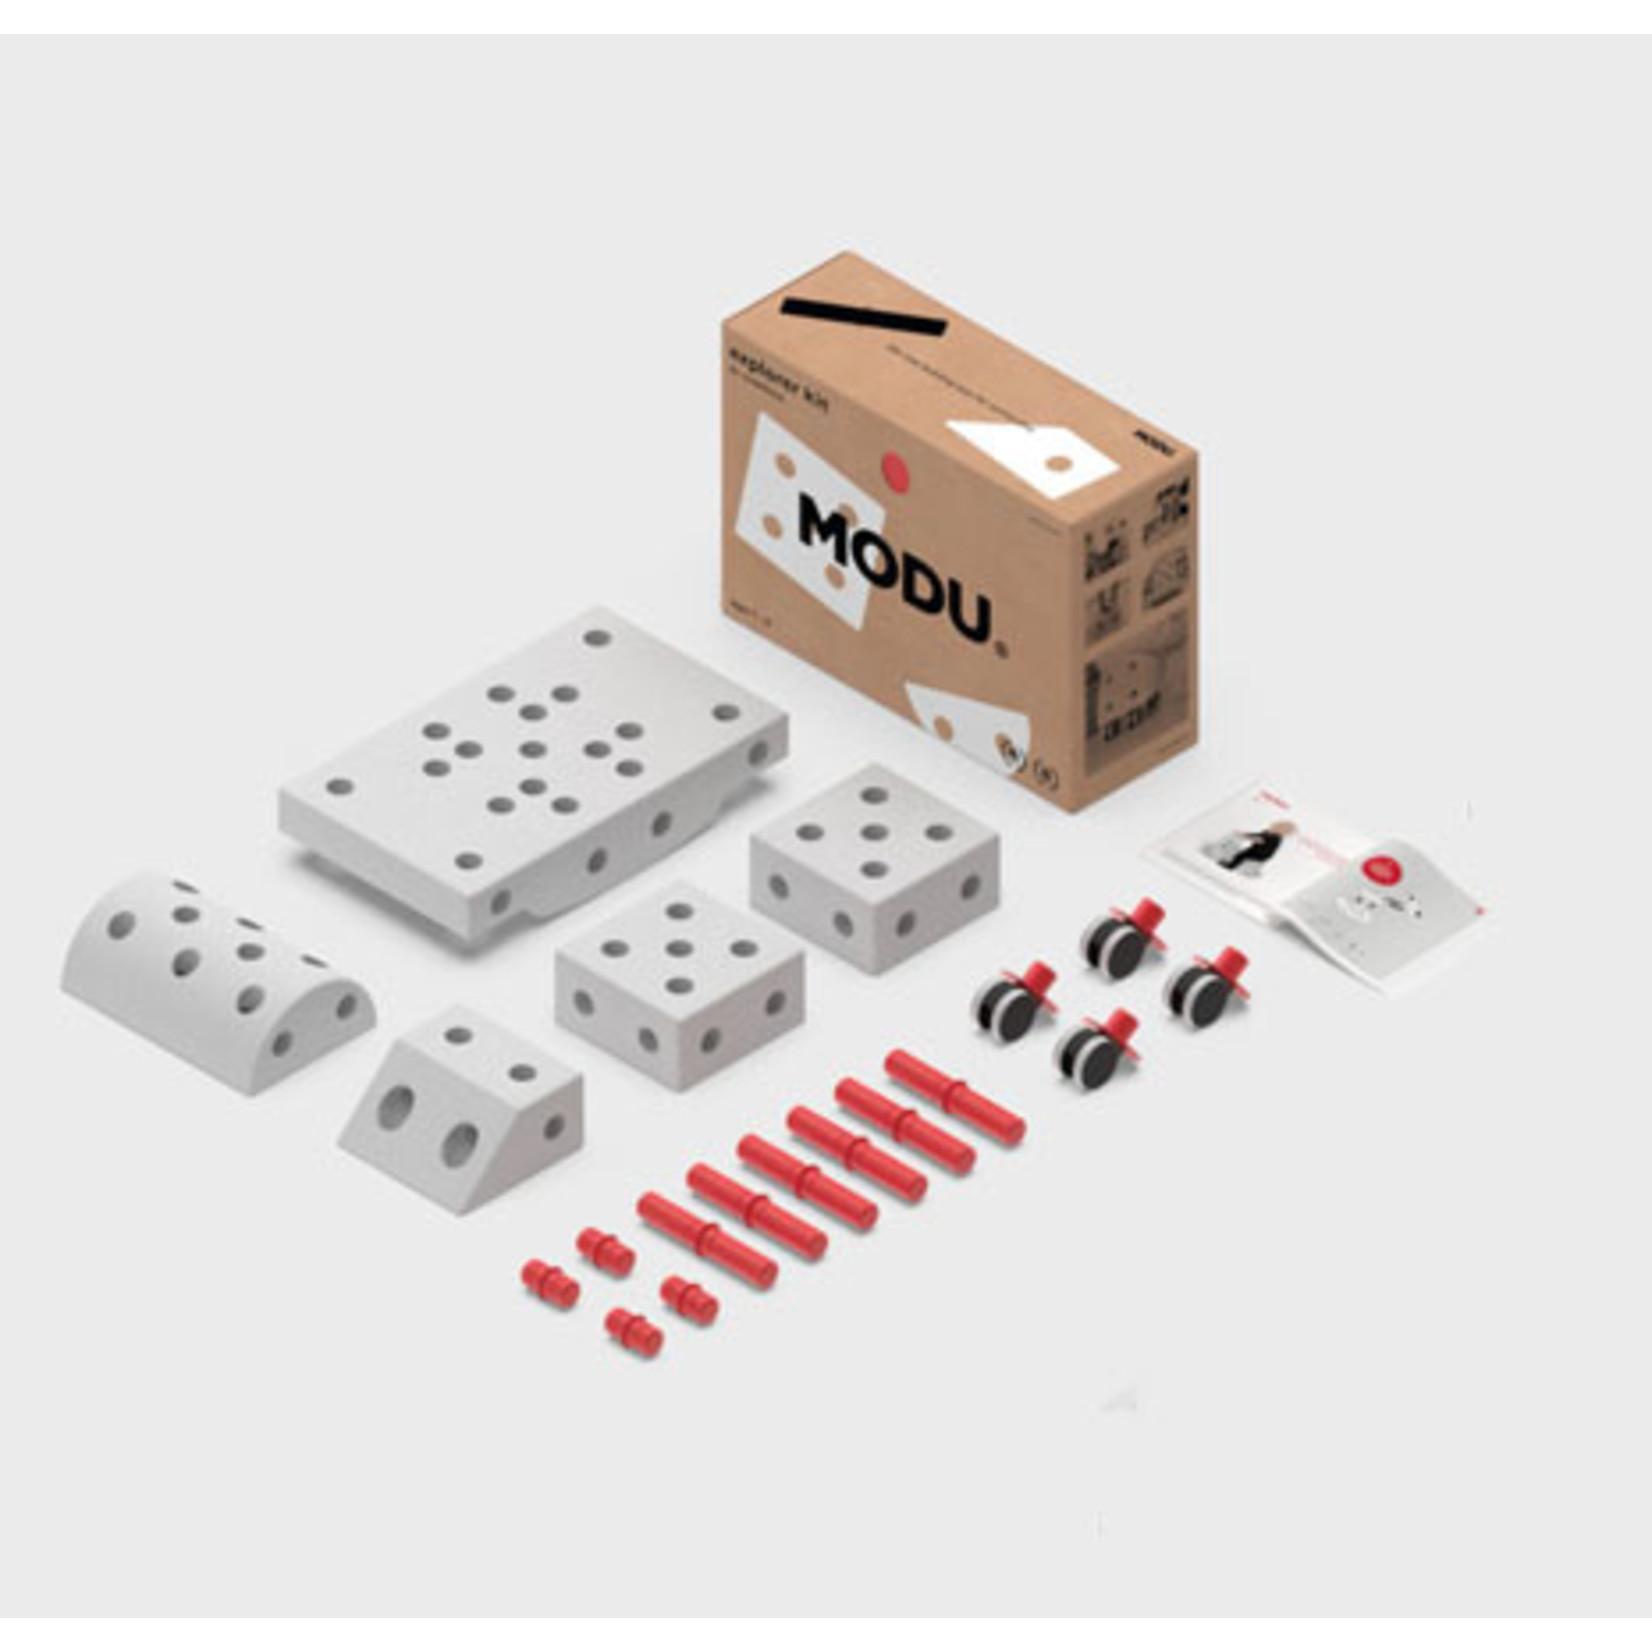 MODU Explorer kit rood